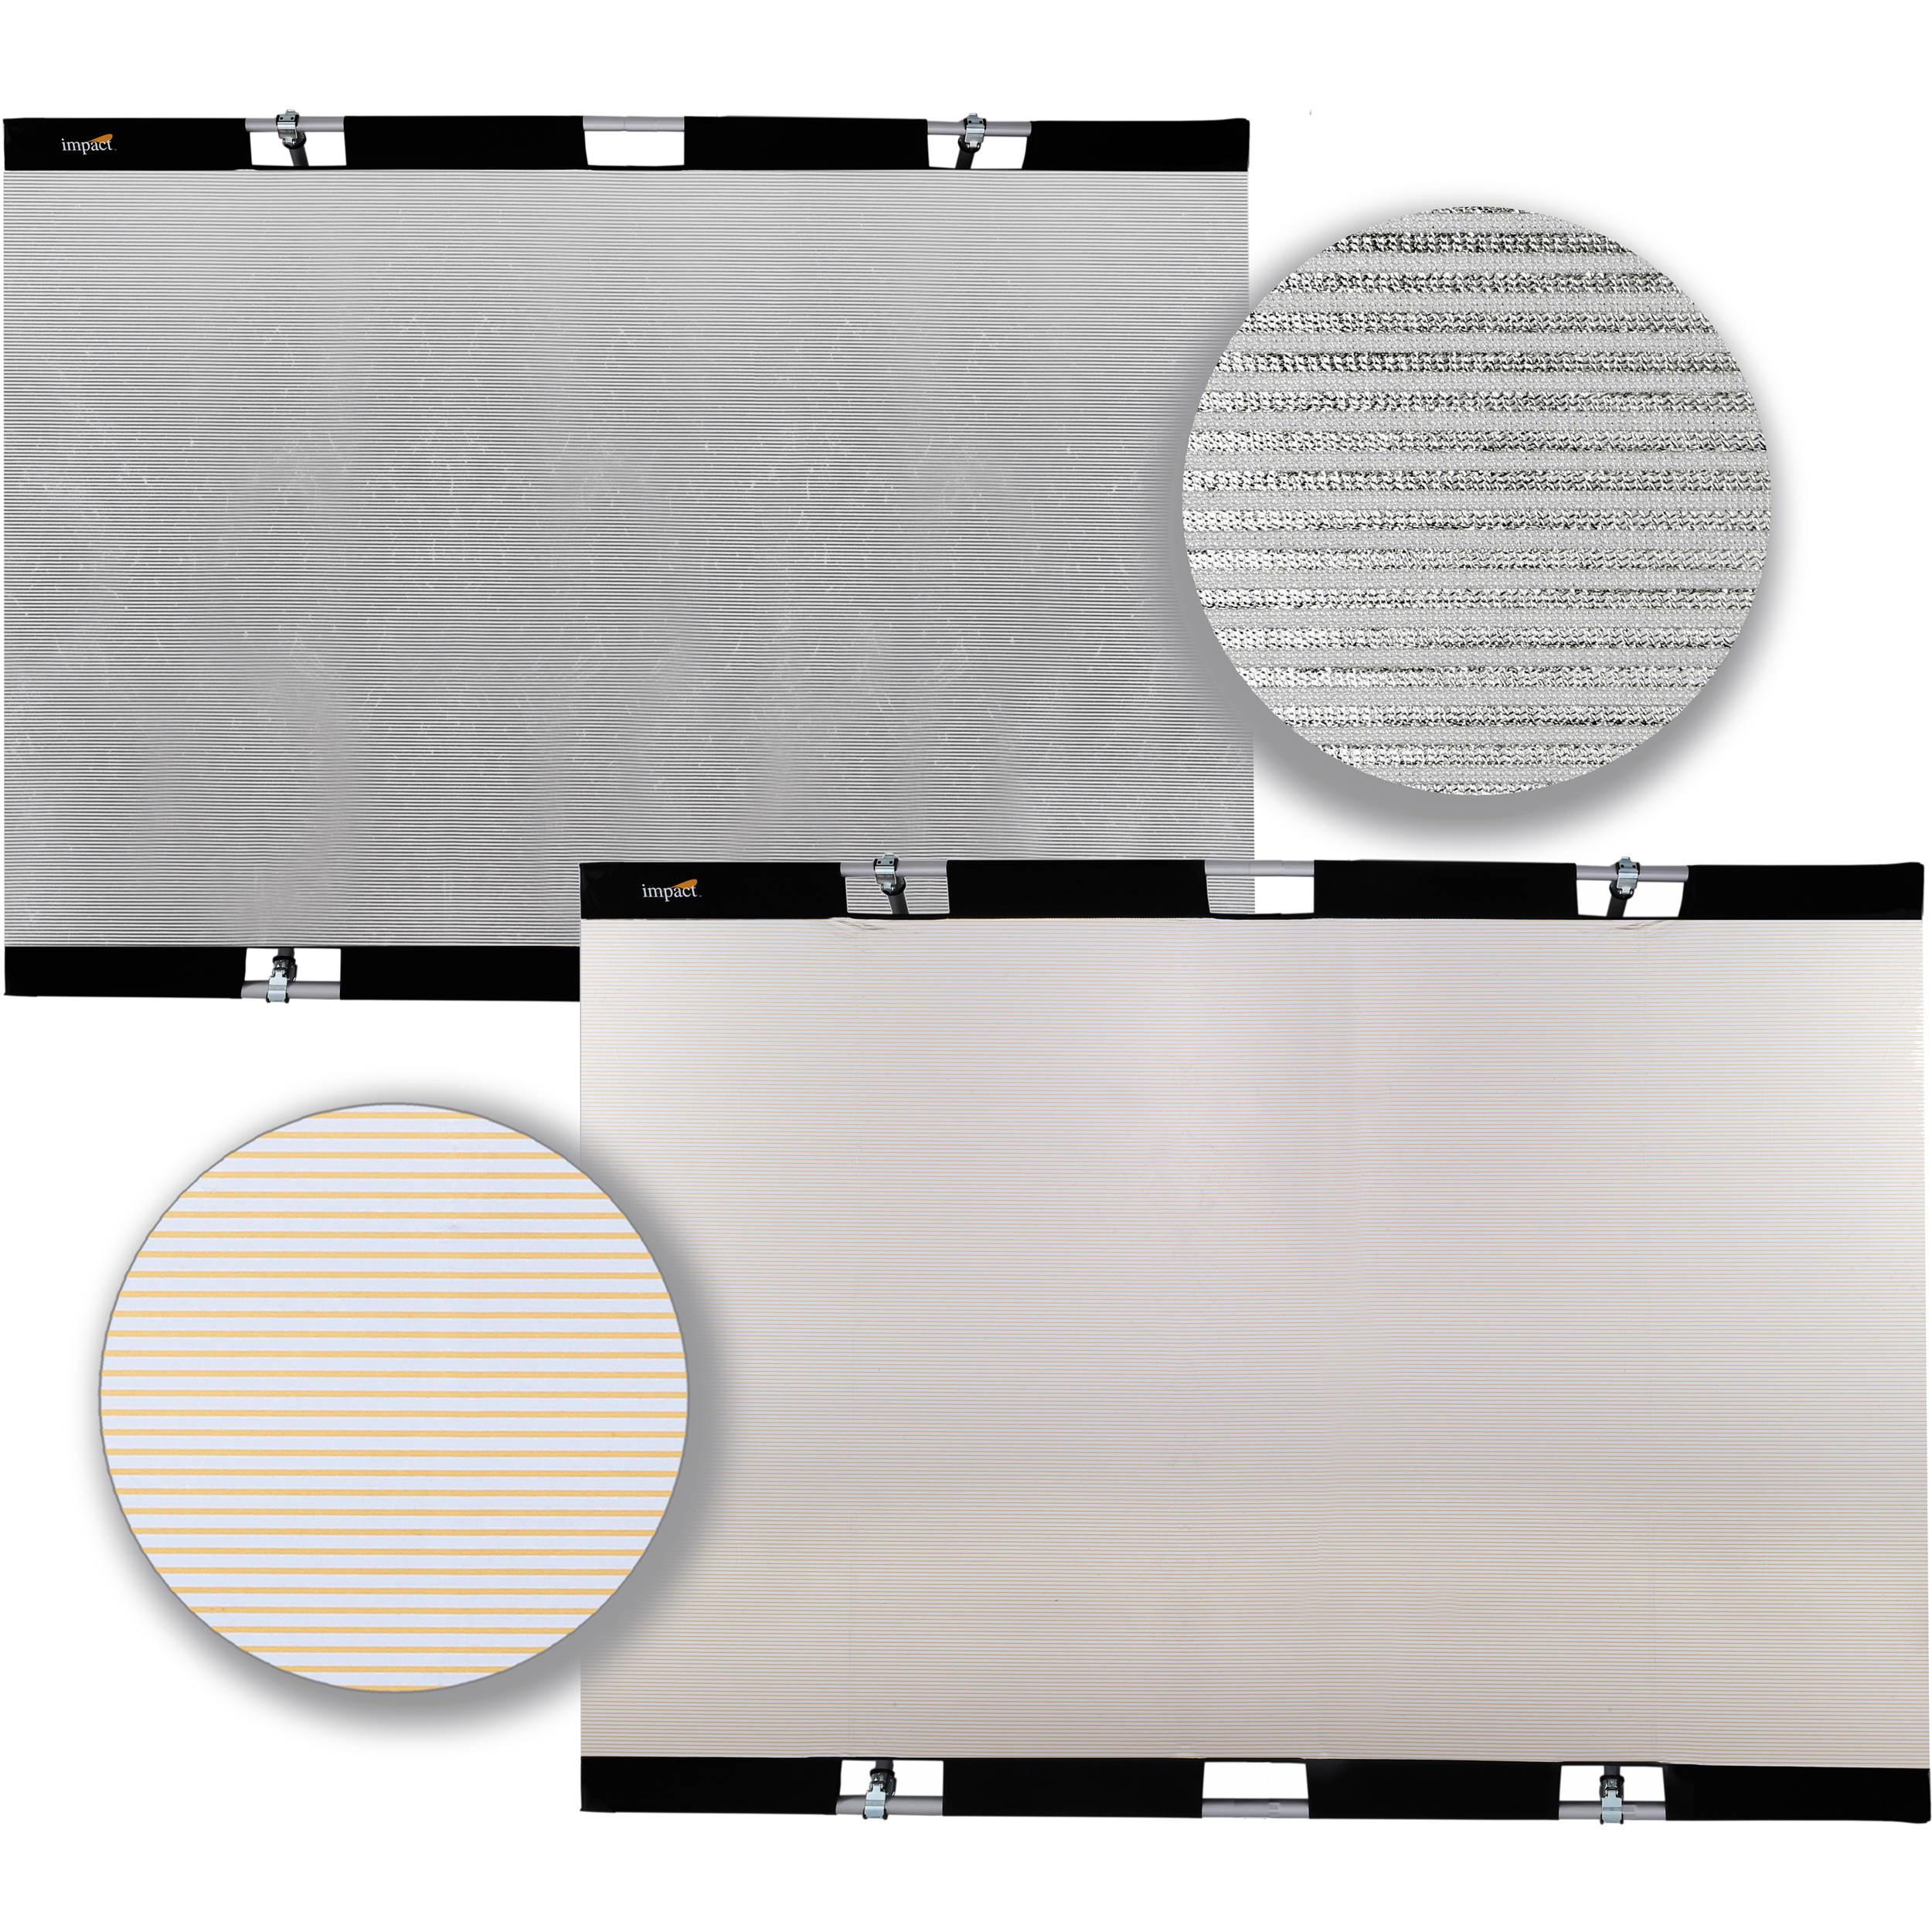 "Impact Panel Frame Reflector Kit - Zebra Gold / Zebra Silver (43 x 67"")"